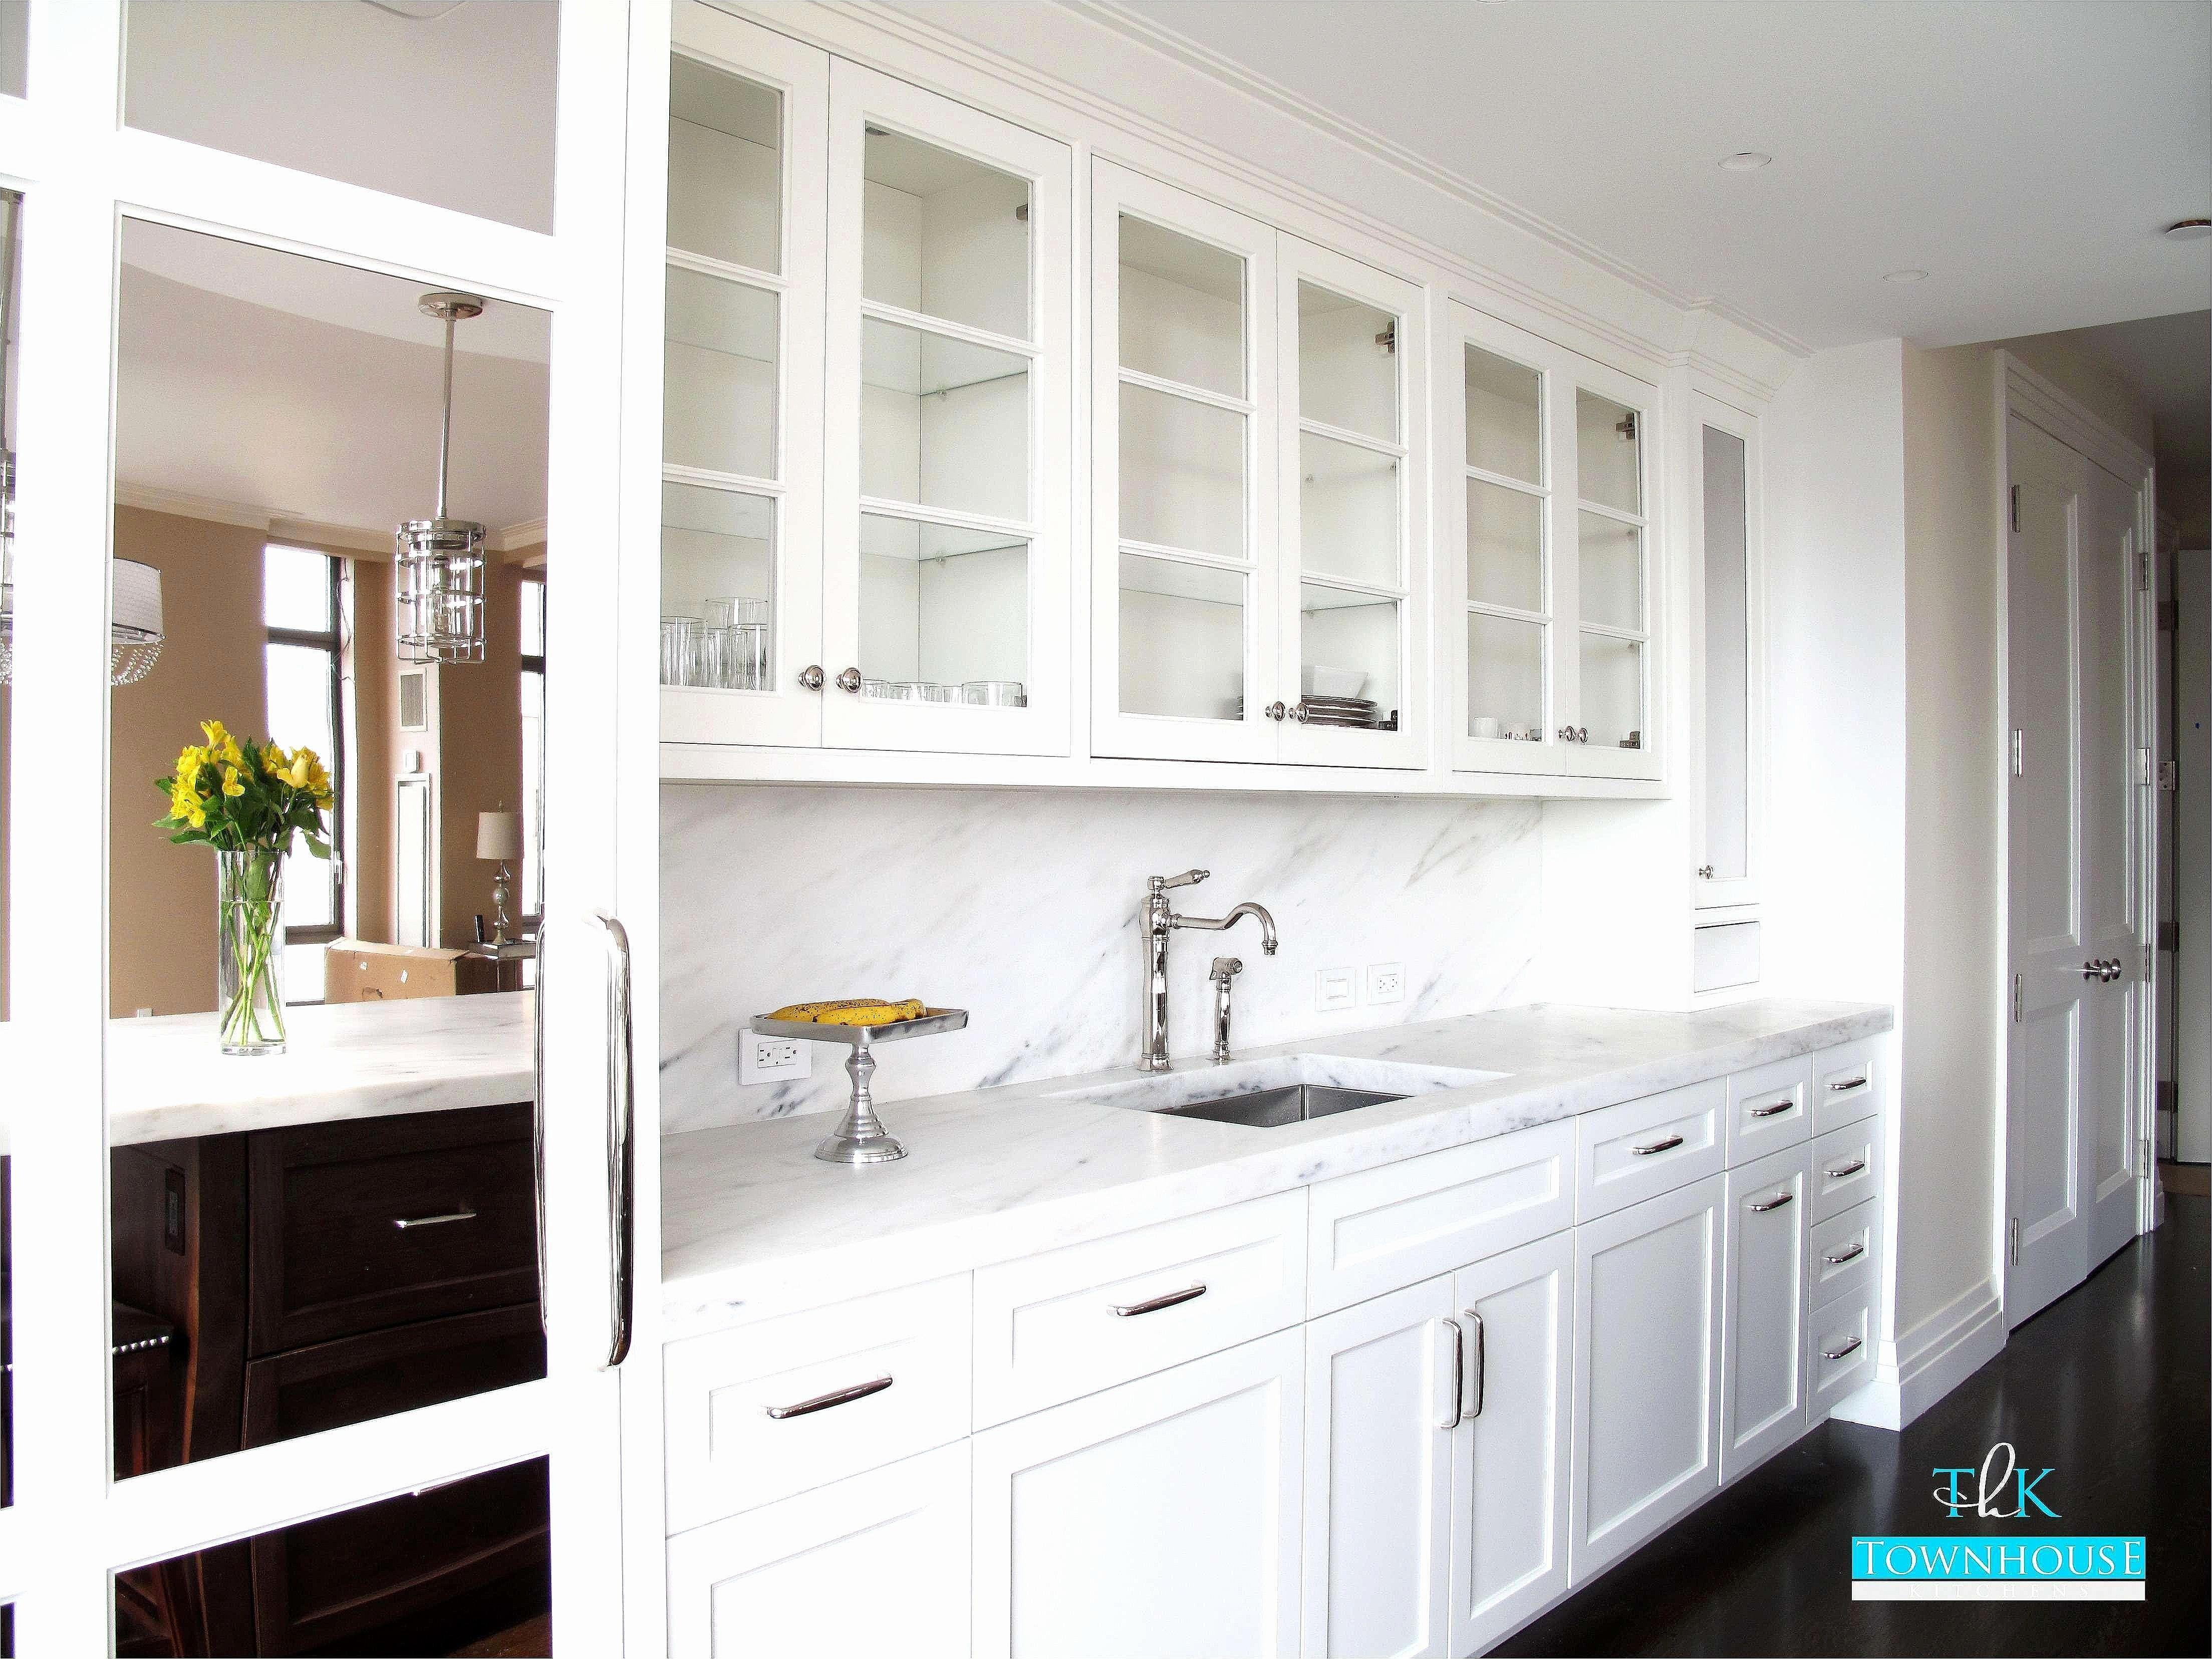 Fresh houzz kitchen backsplash ideas beautiful kitchen